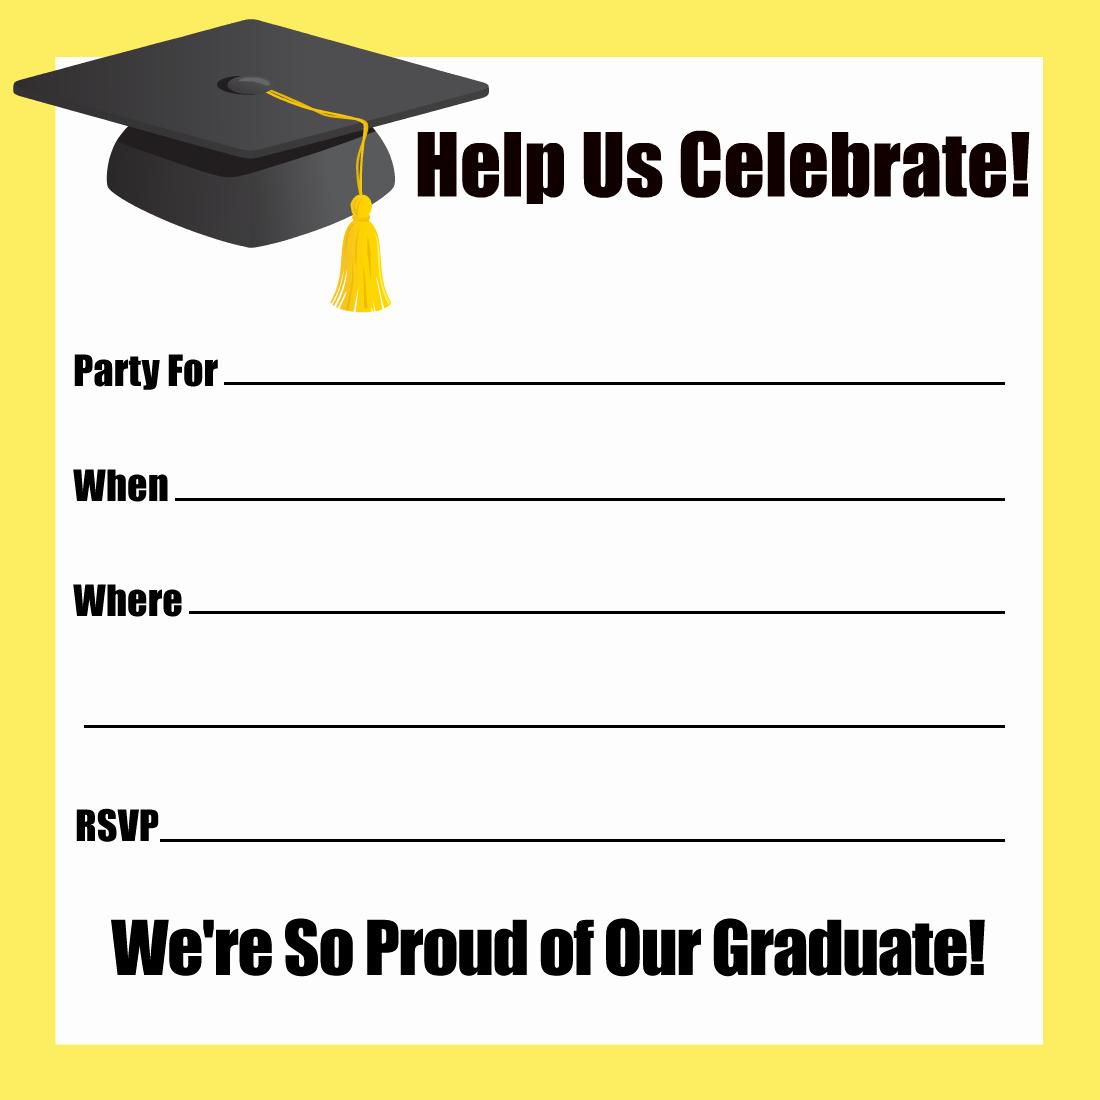 Free Graduation Party Invitation Templates New Free Printable Graduation Party Invitations Templates